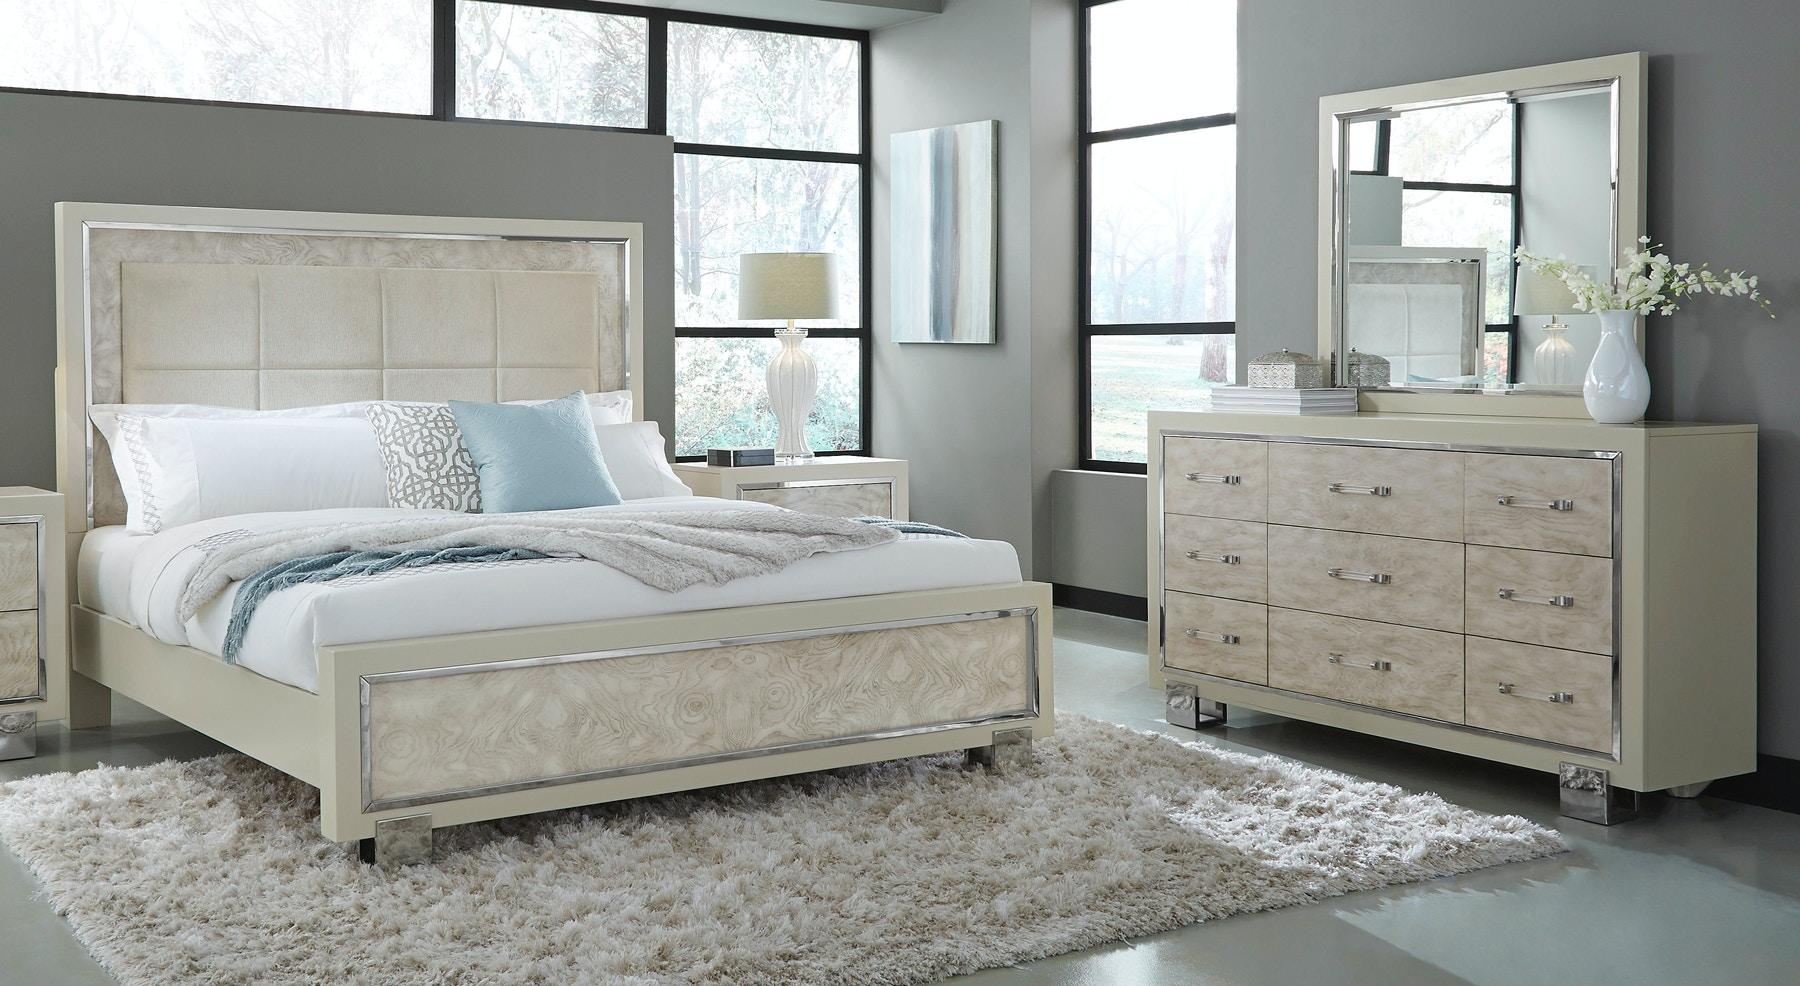 Pulaski Furniture Cydney Bedroom Group   King 812765